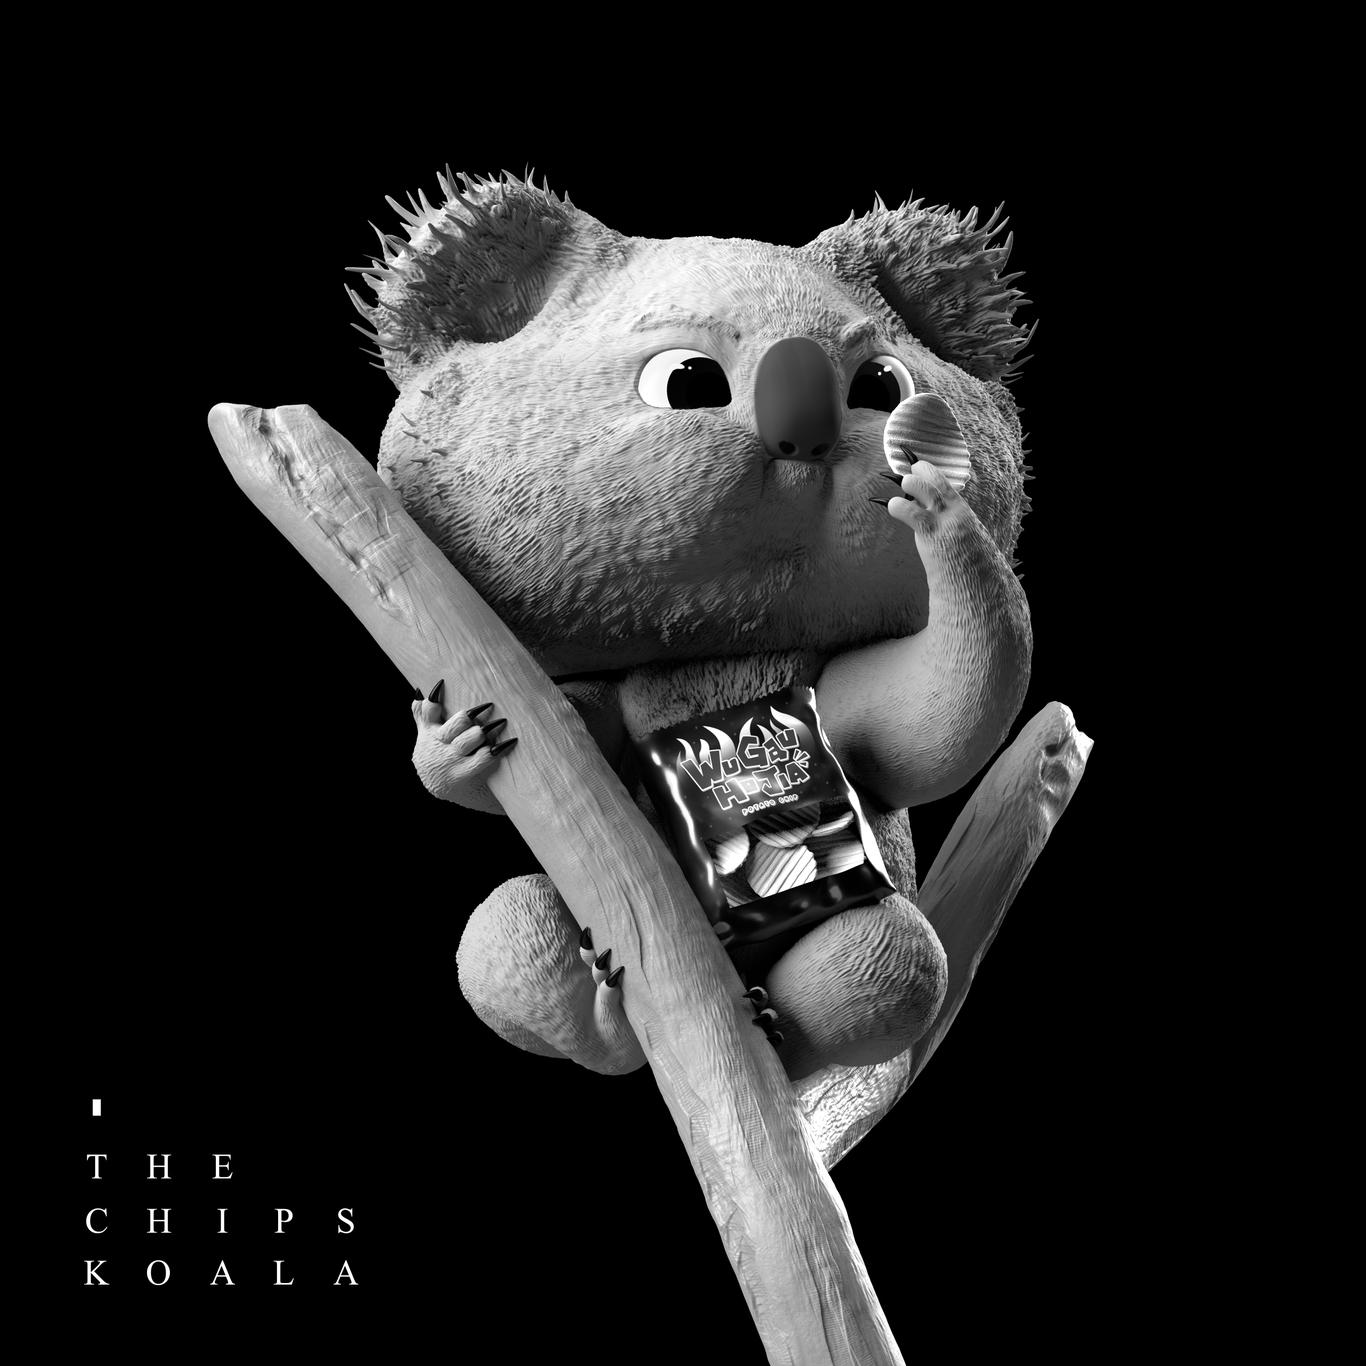 Nick2222g2 the chips koala 1 0a60edad 7vcs